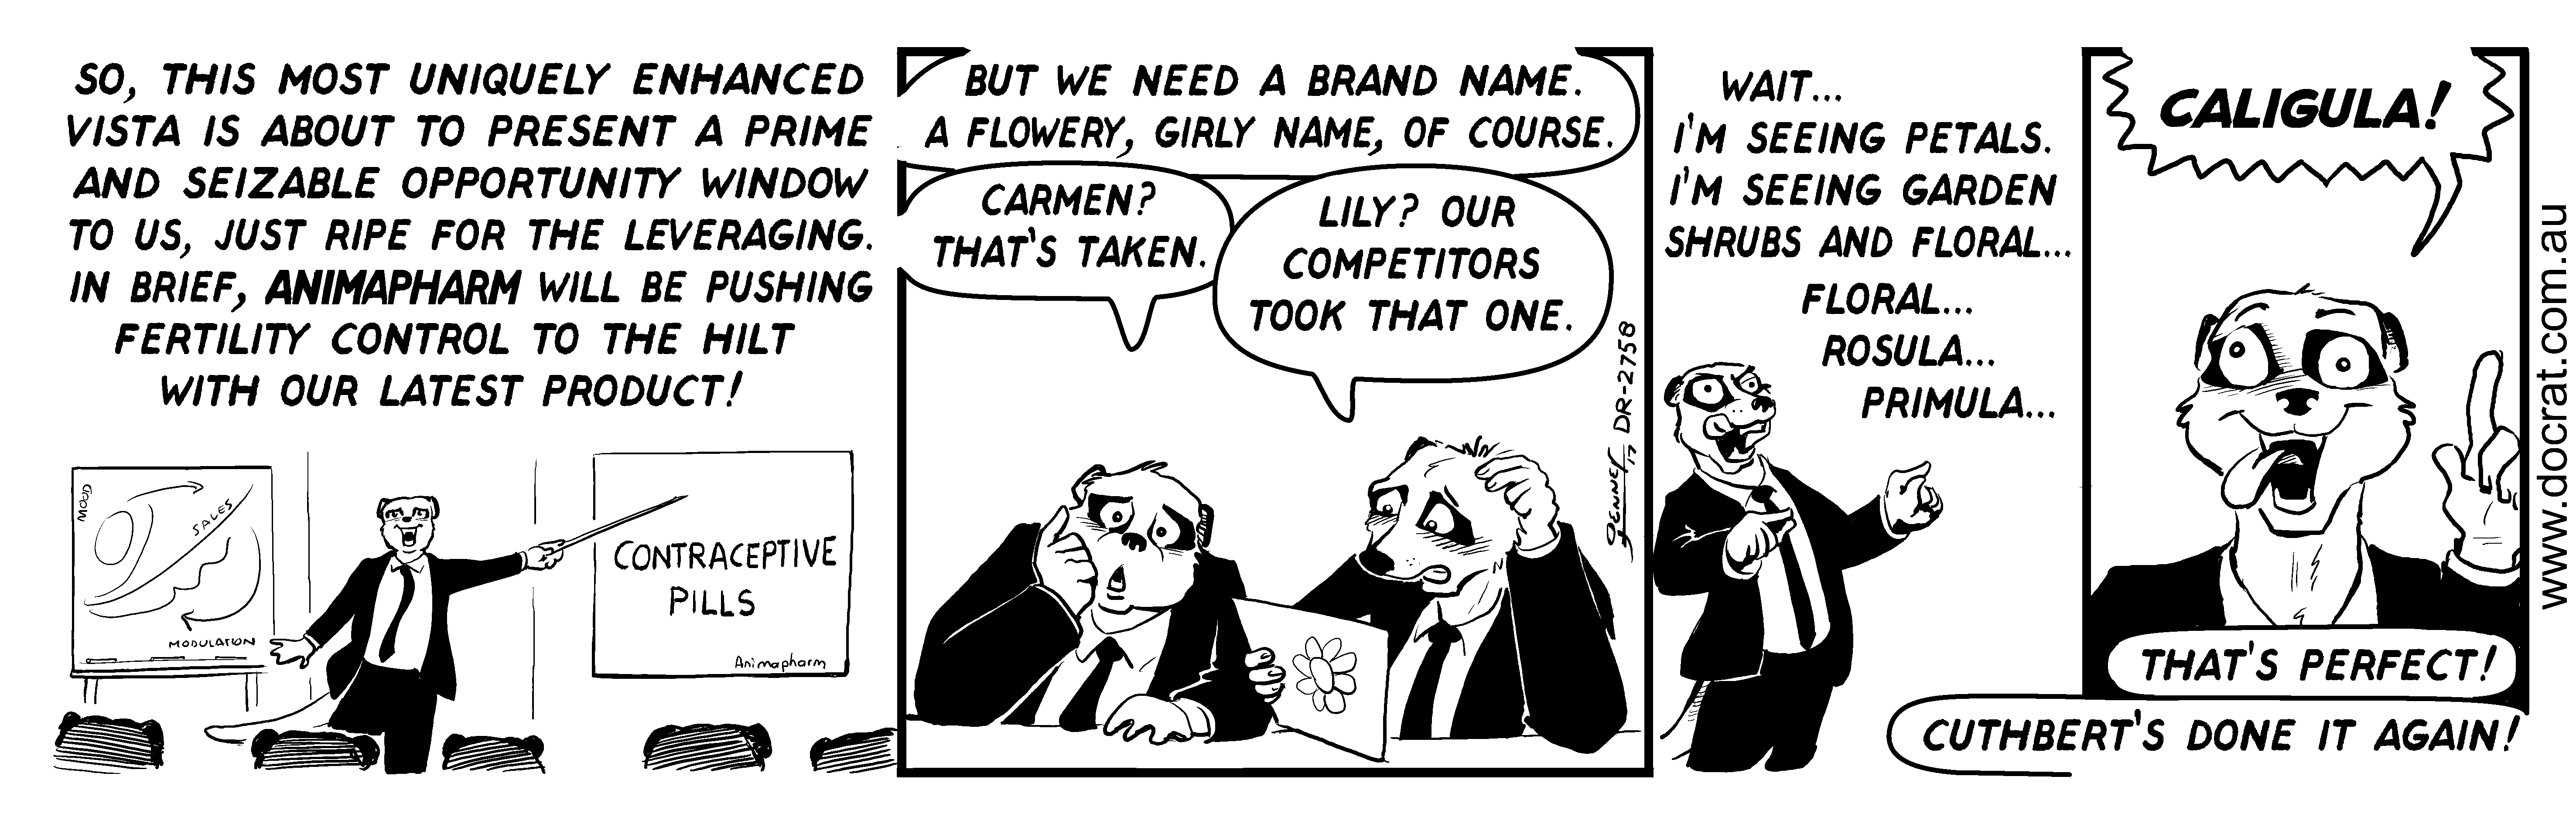 20170419